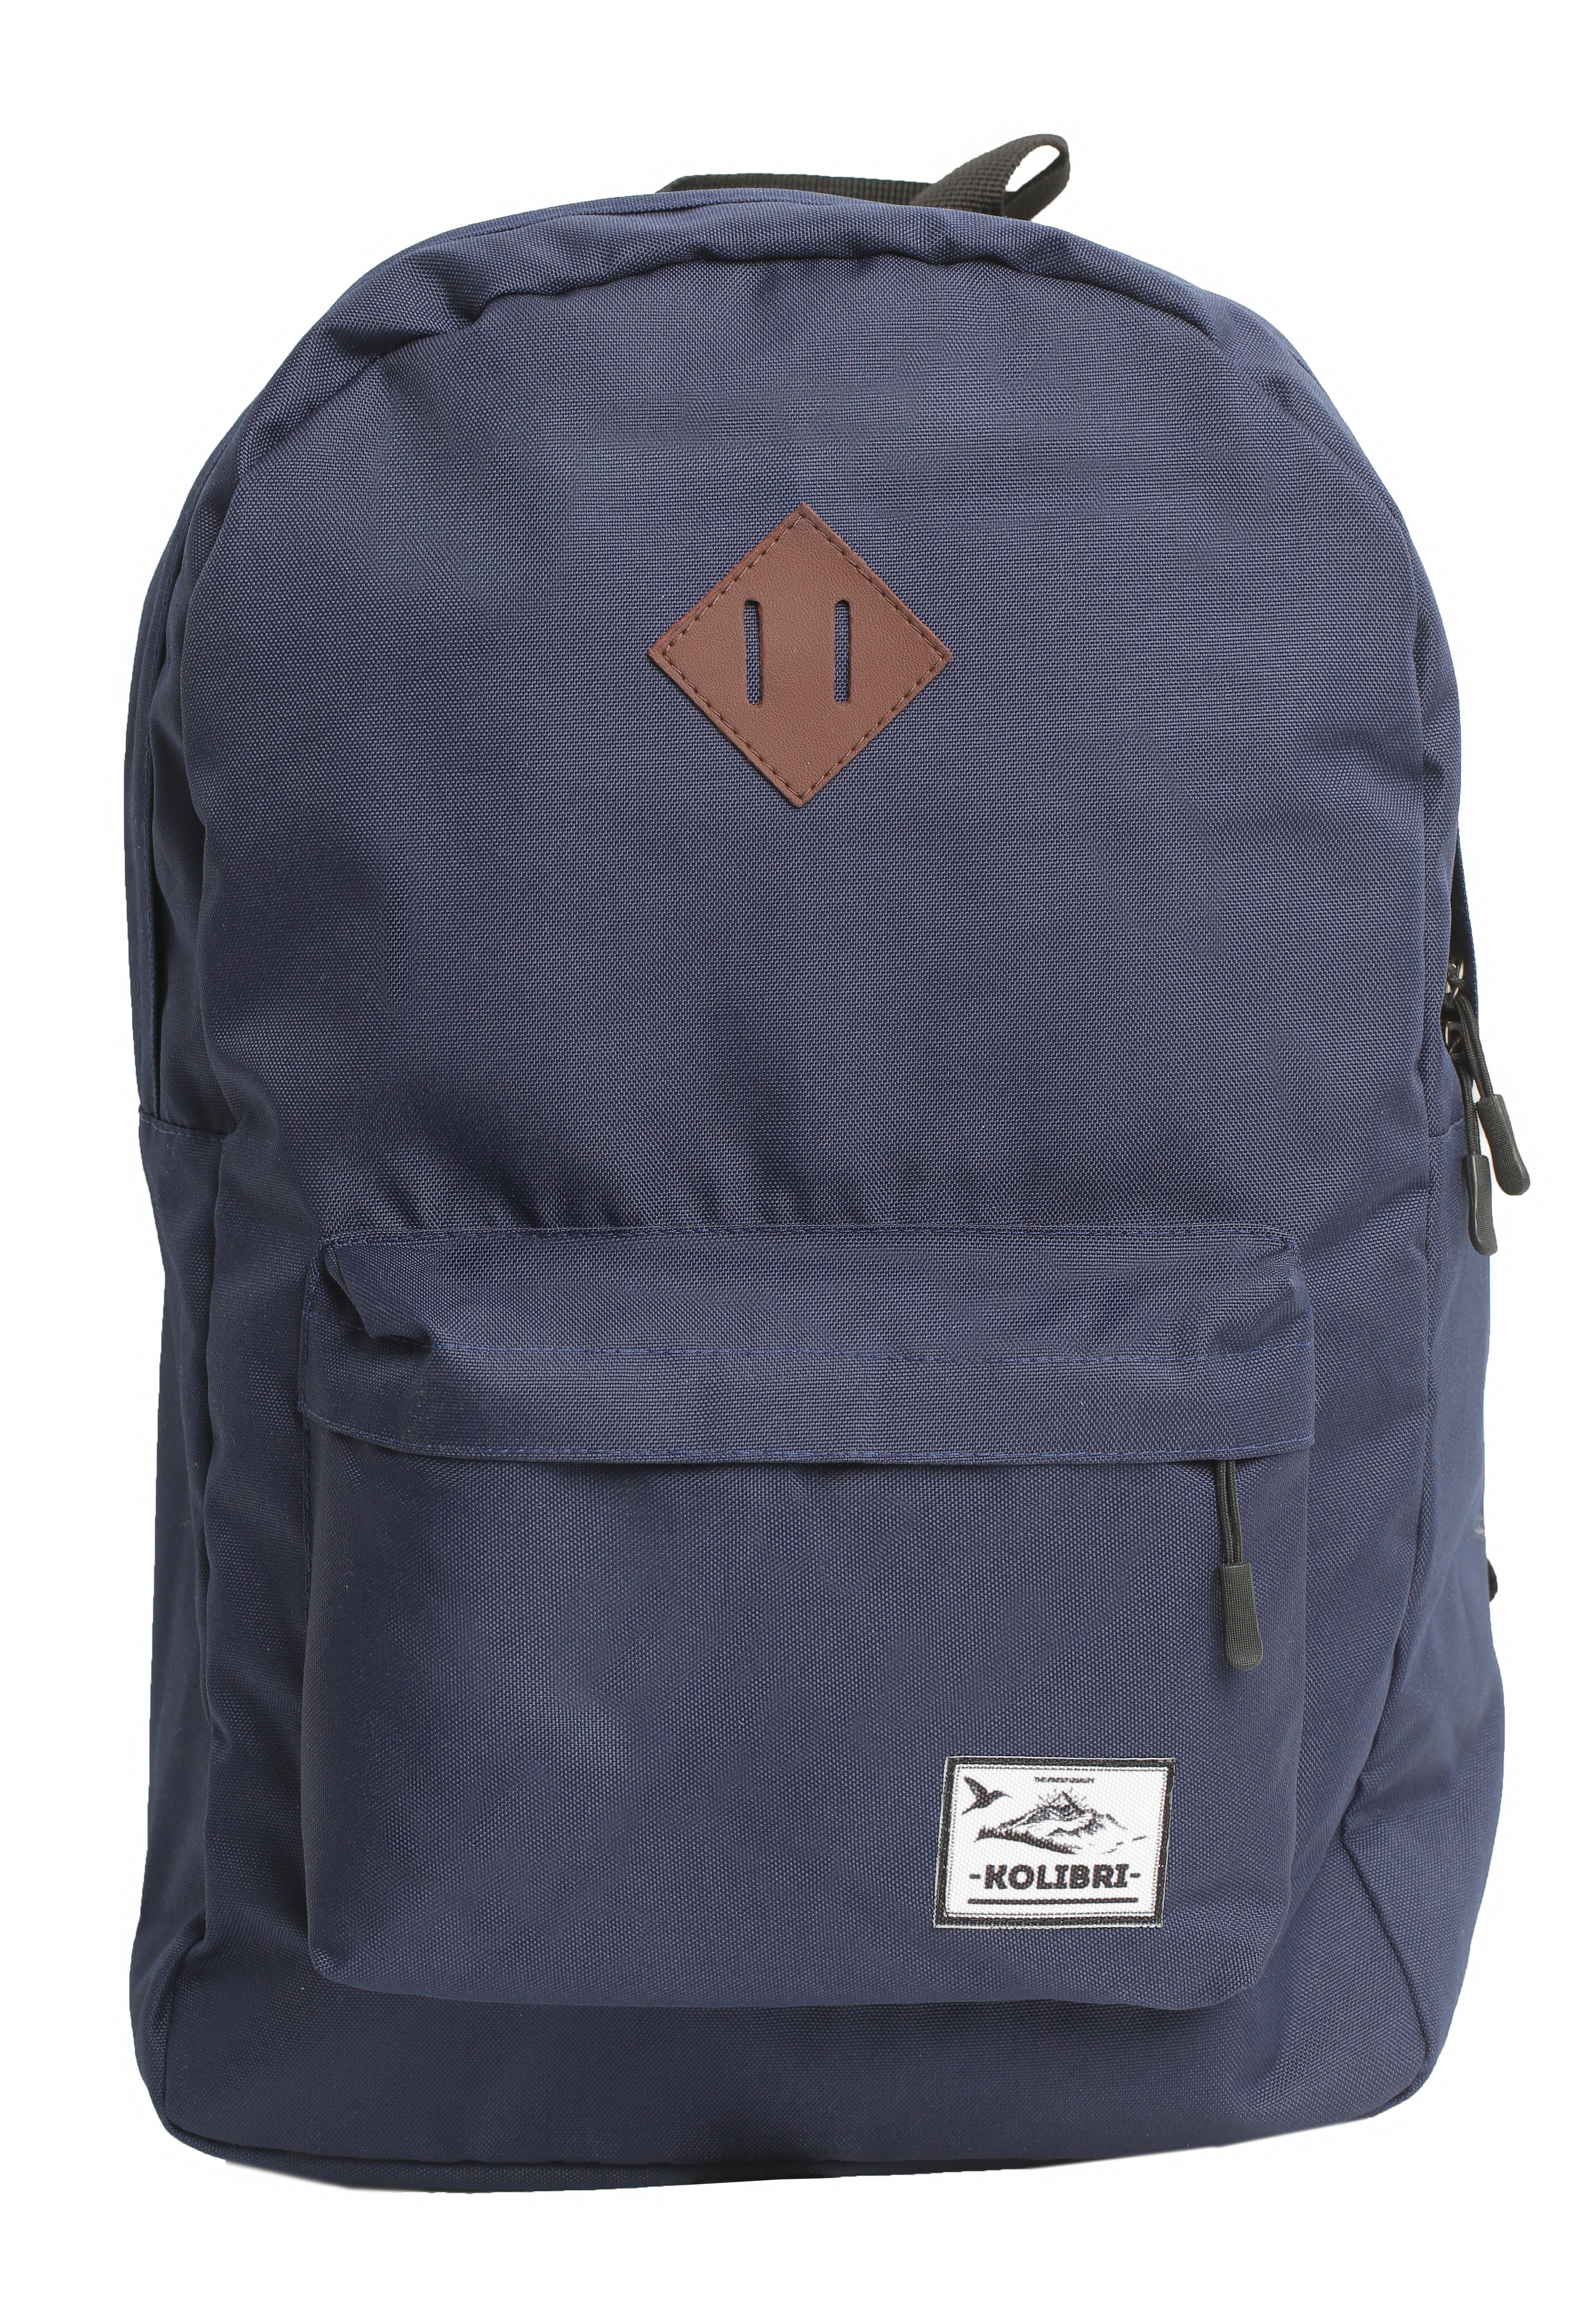 Рюкзак kolibri daypack classic dark blue большой